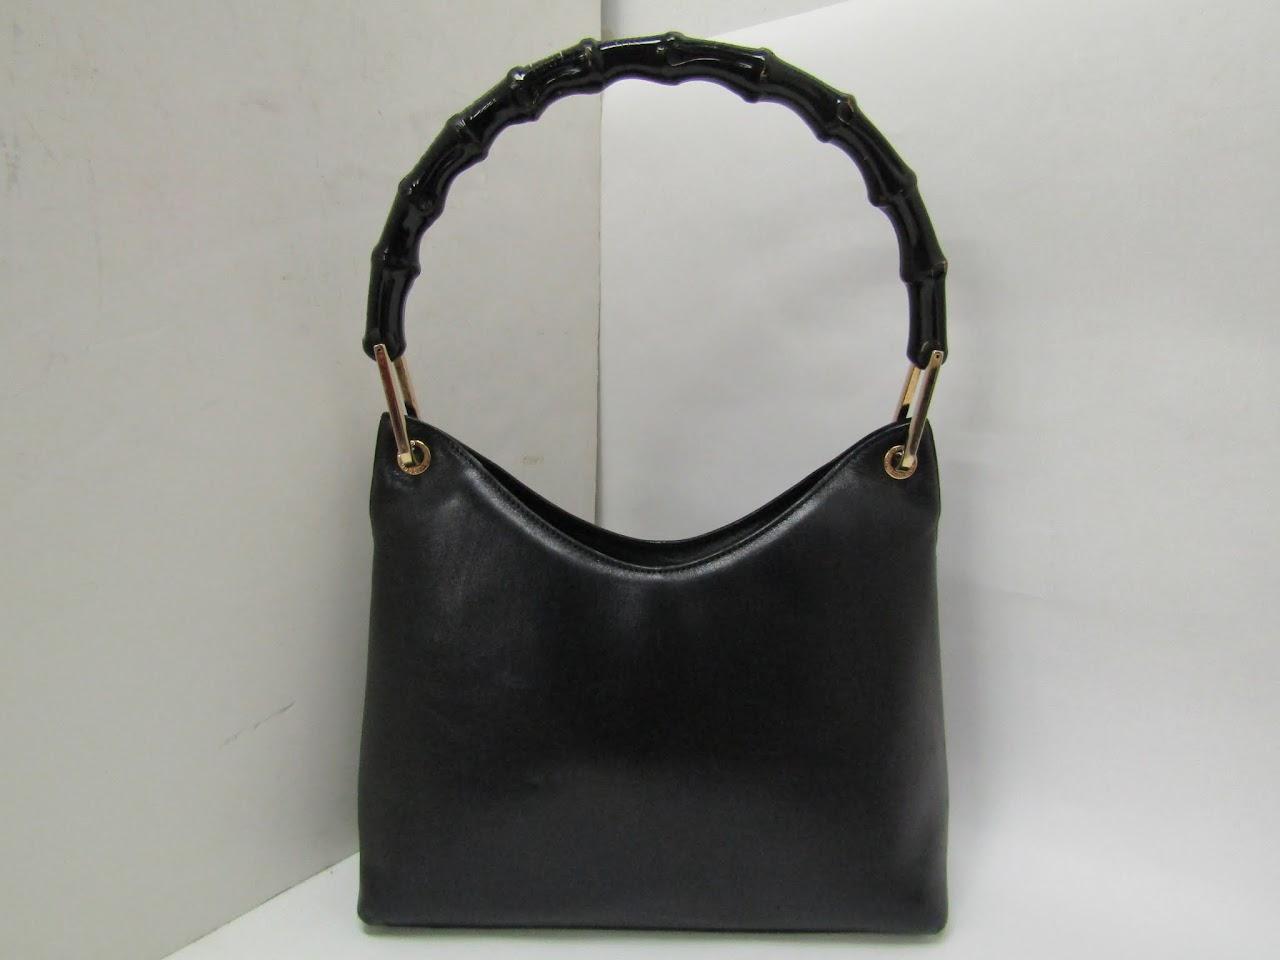 Vintage Gucci Bamboo Strap Bag